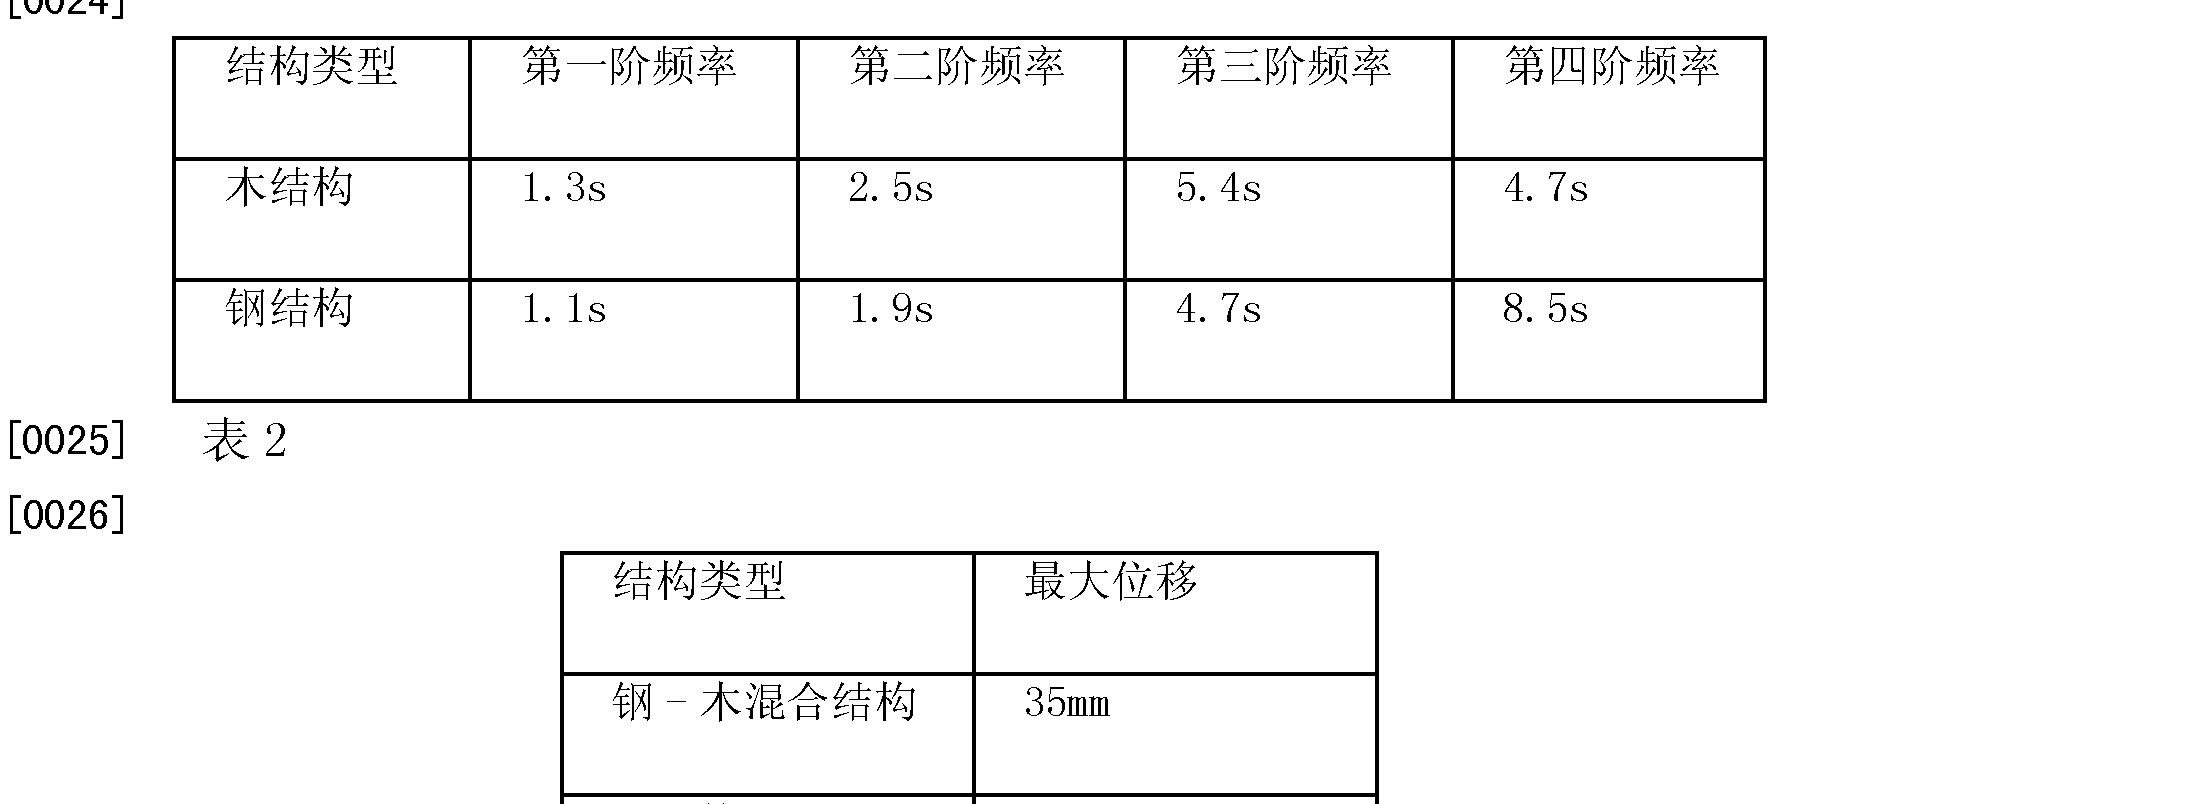 Figure CN201924450UD00061